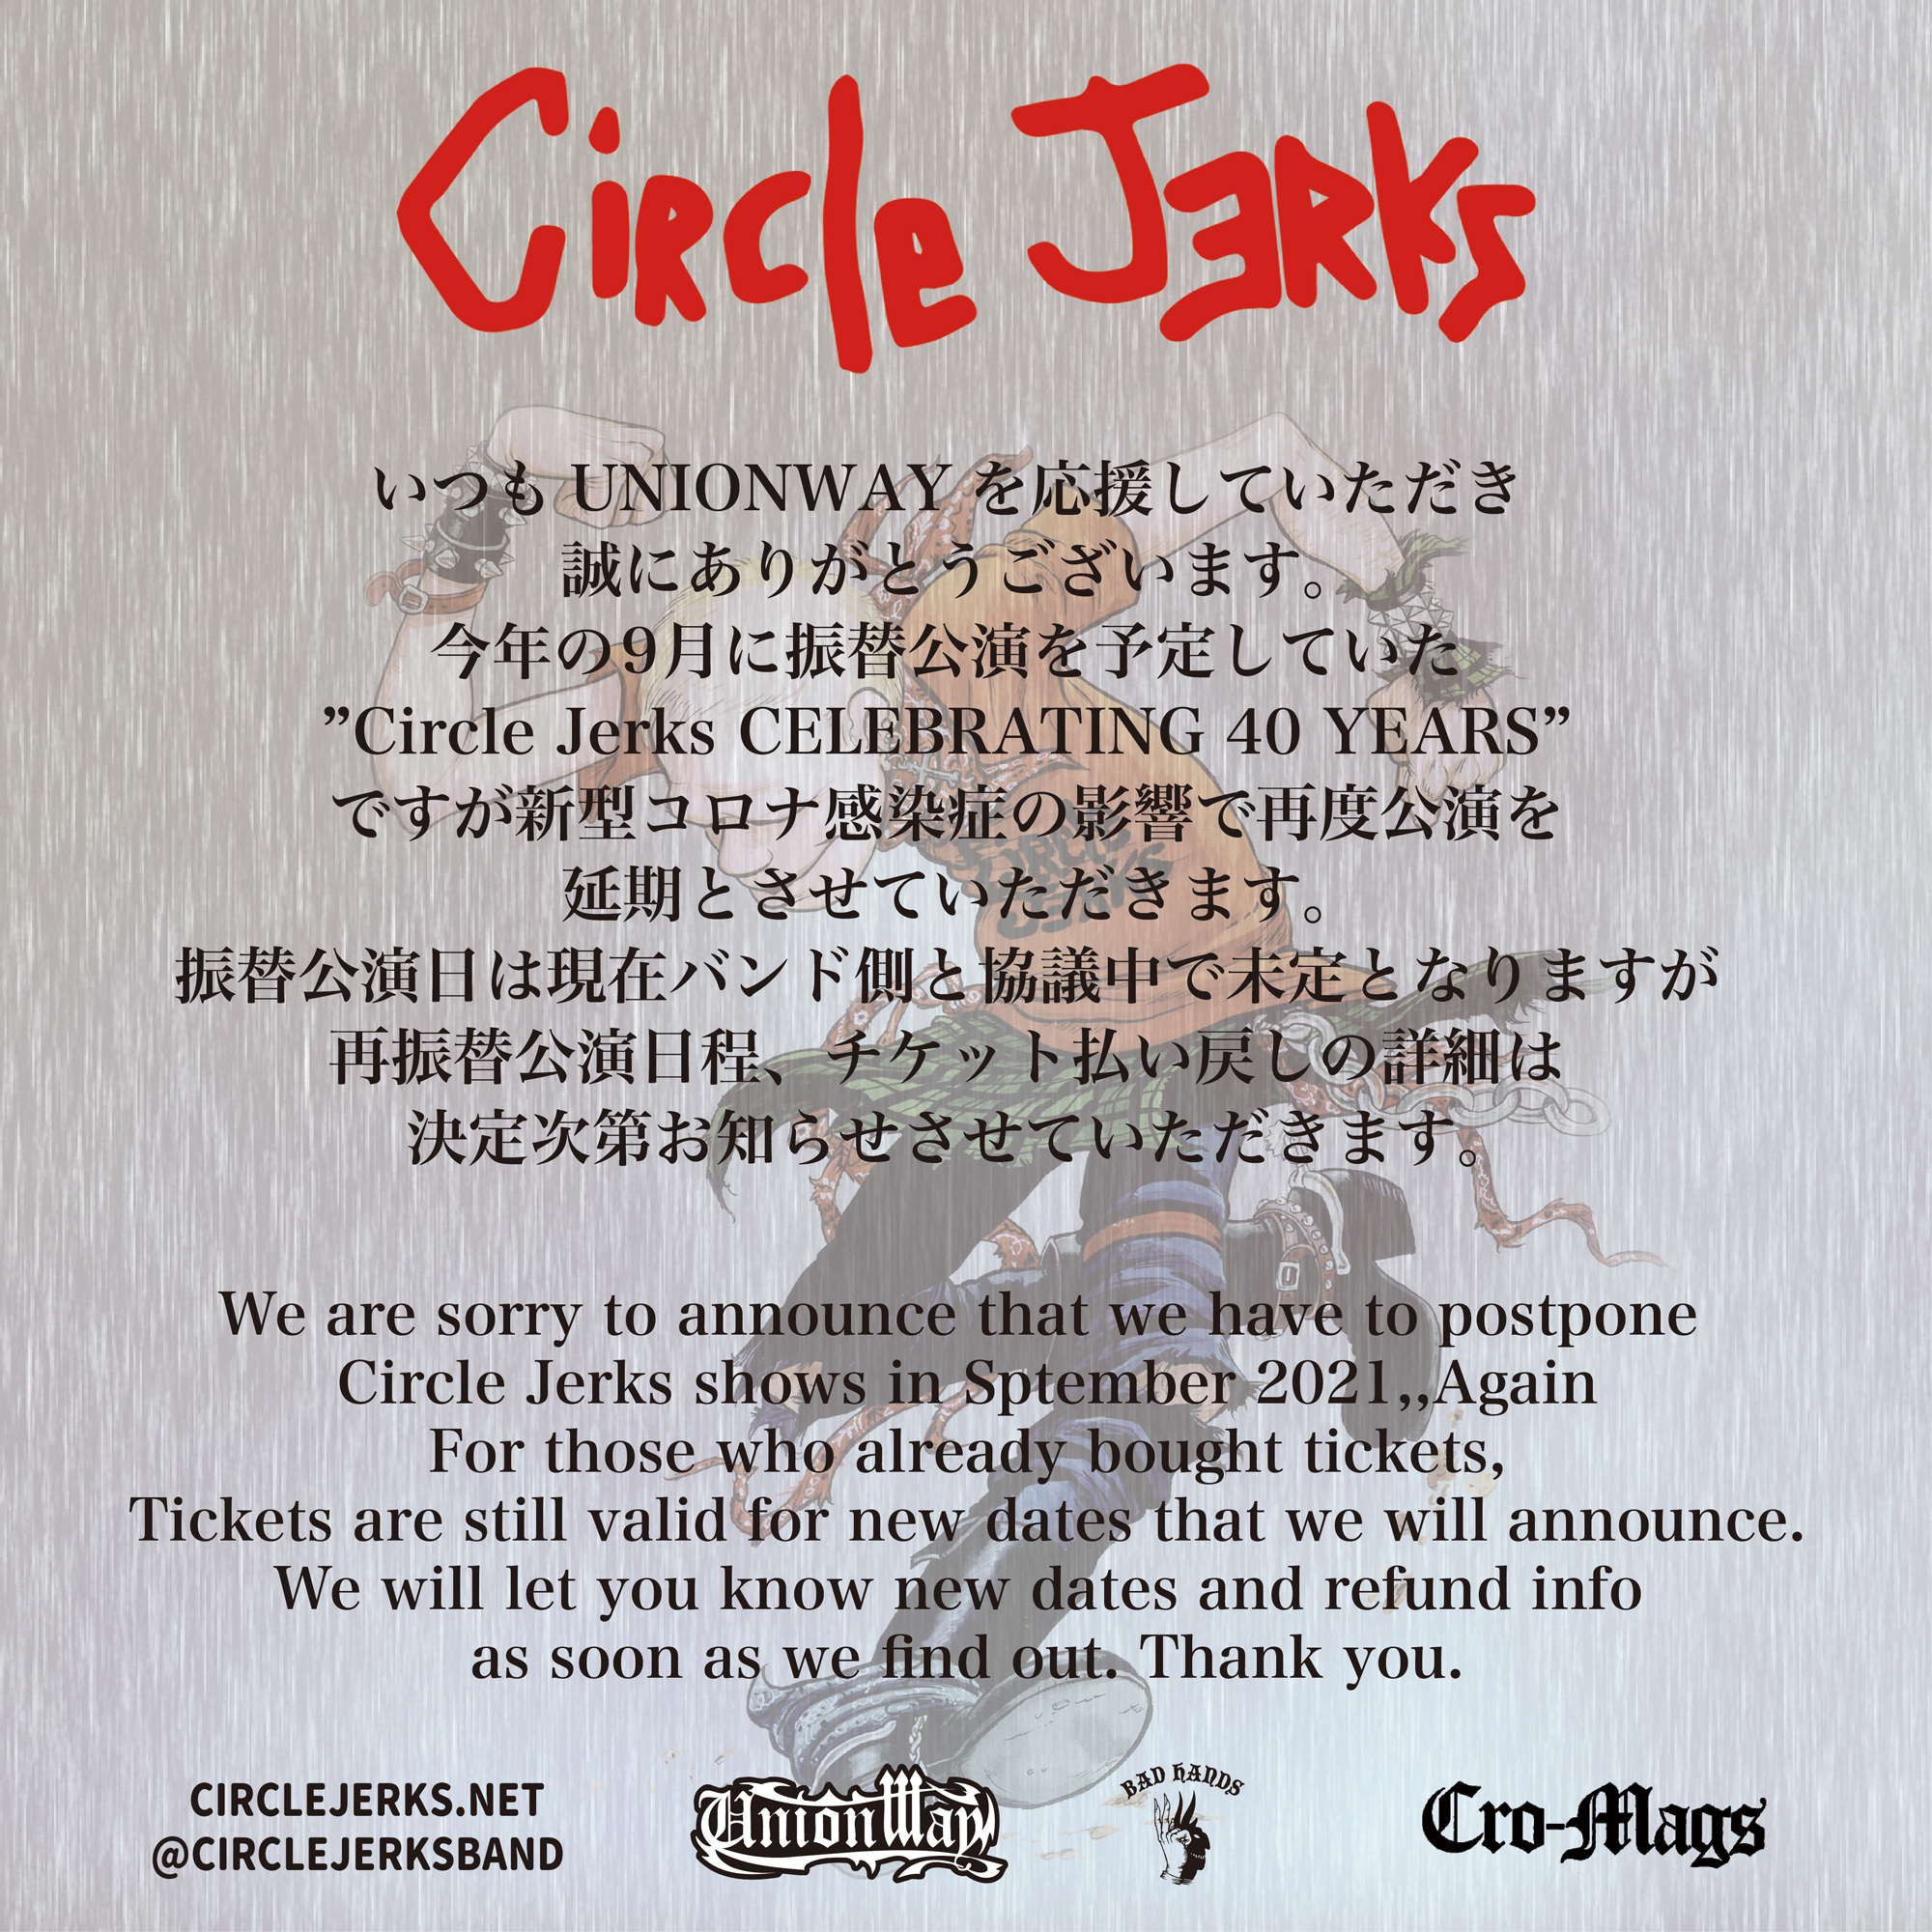 【延期】UNIONWAY Presents Circle Jerks CELEBRATING 40 YEARS JAPAN TOUR 2021